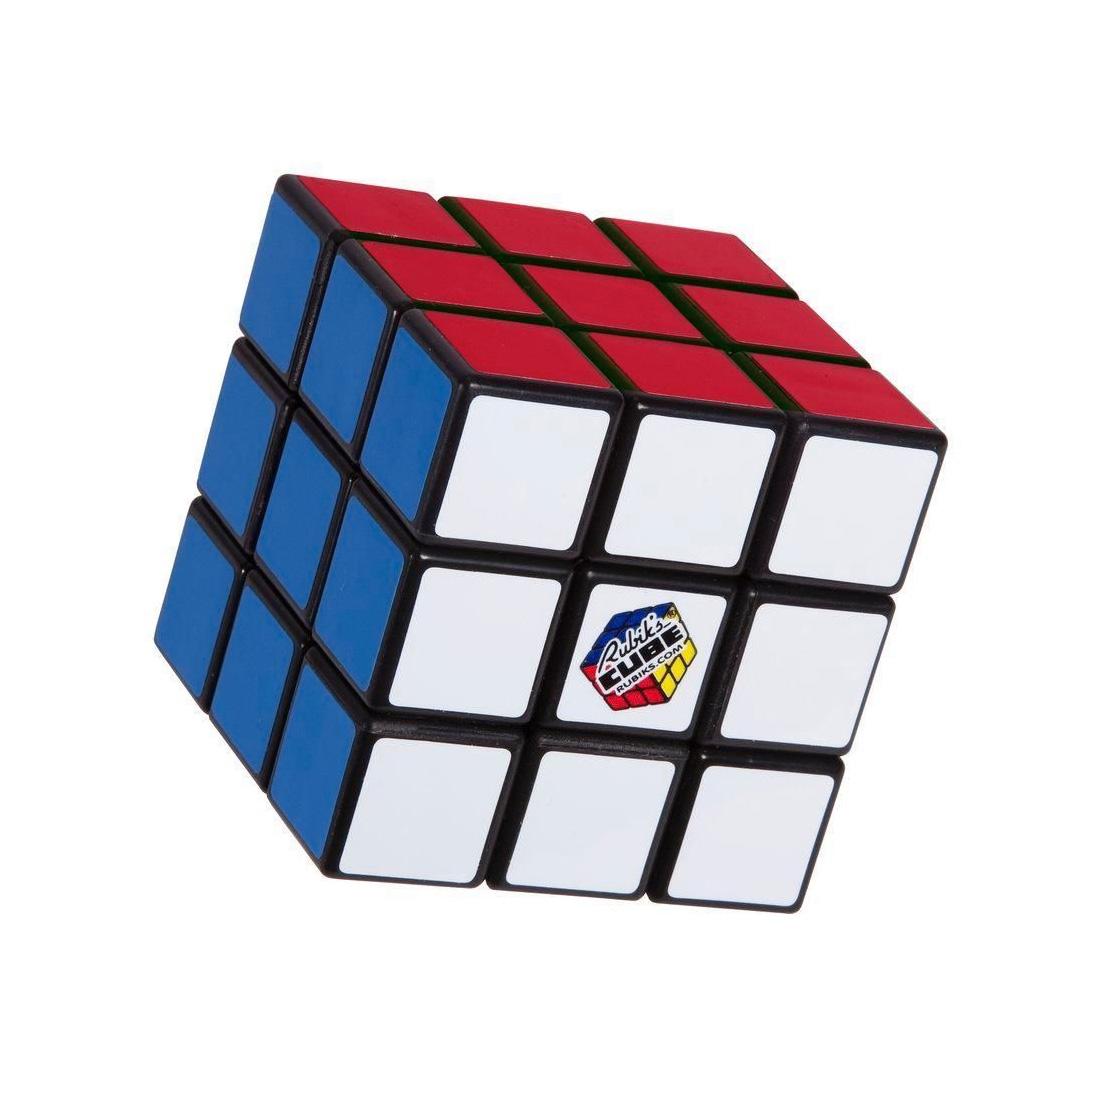 Hot rubik's cube sex porn photo